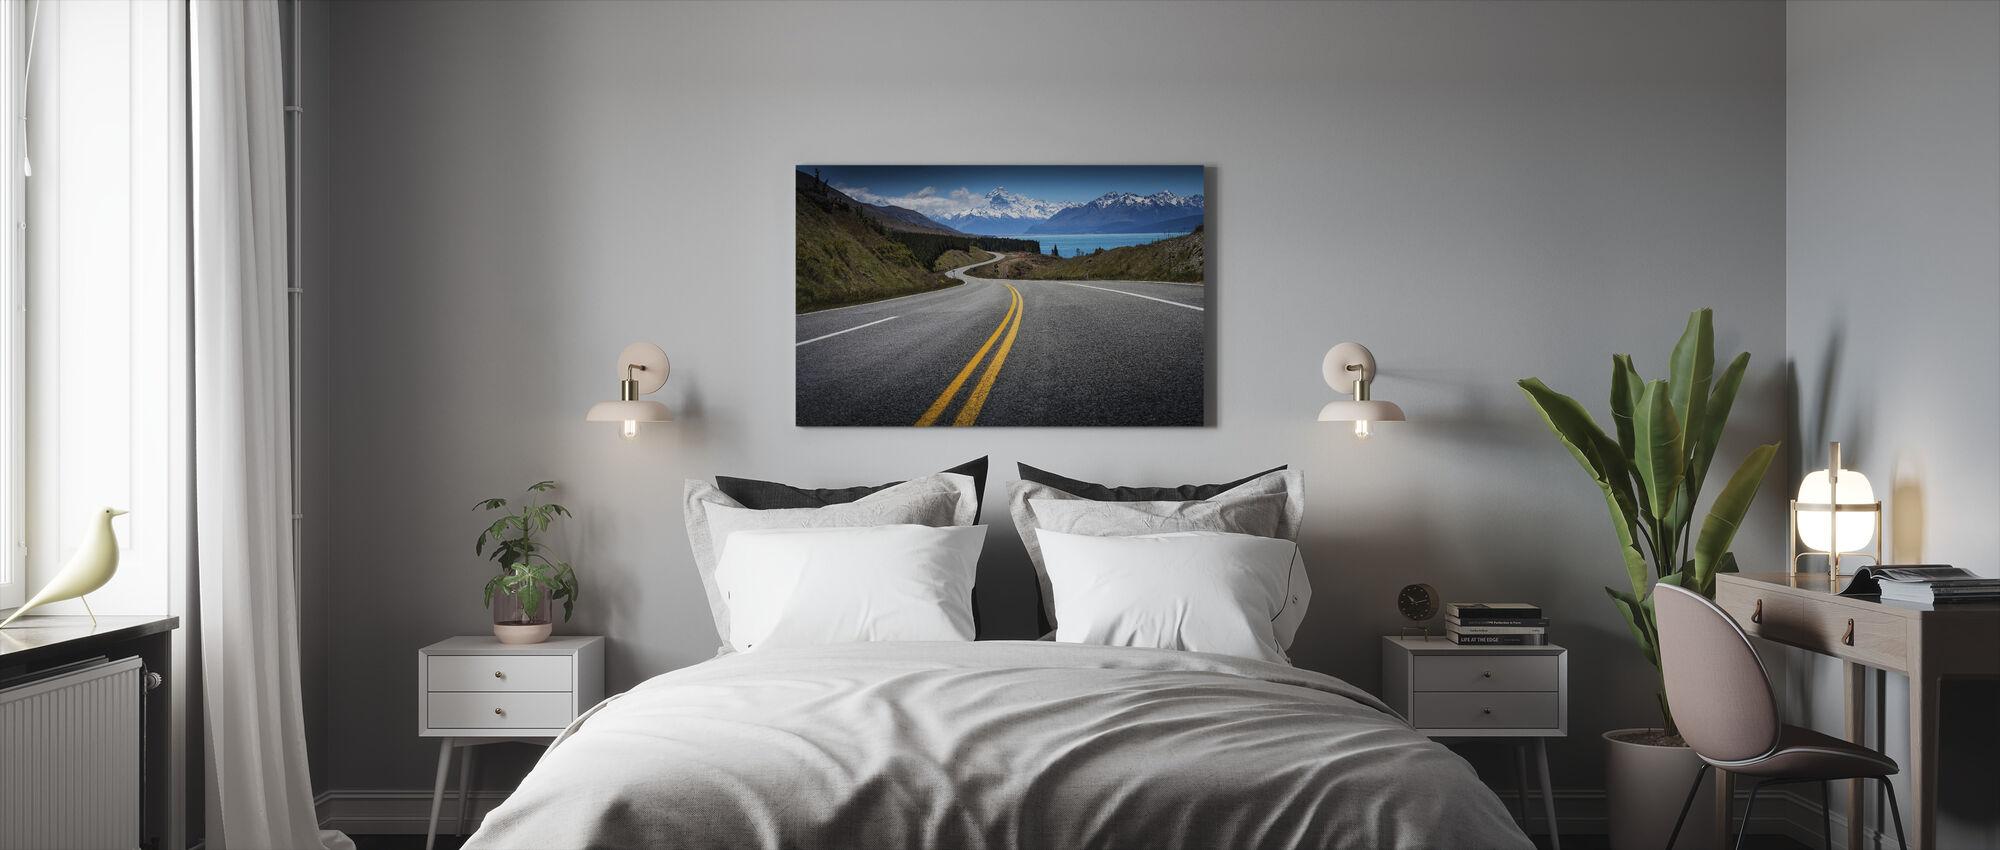 Tie Mount Cookille - Canvastaulu - Makuuhuone